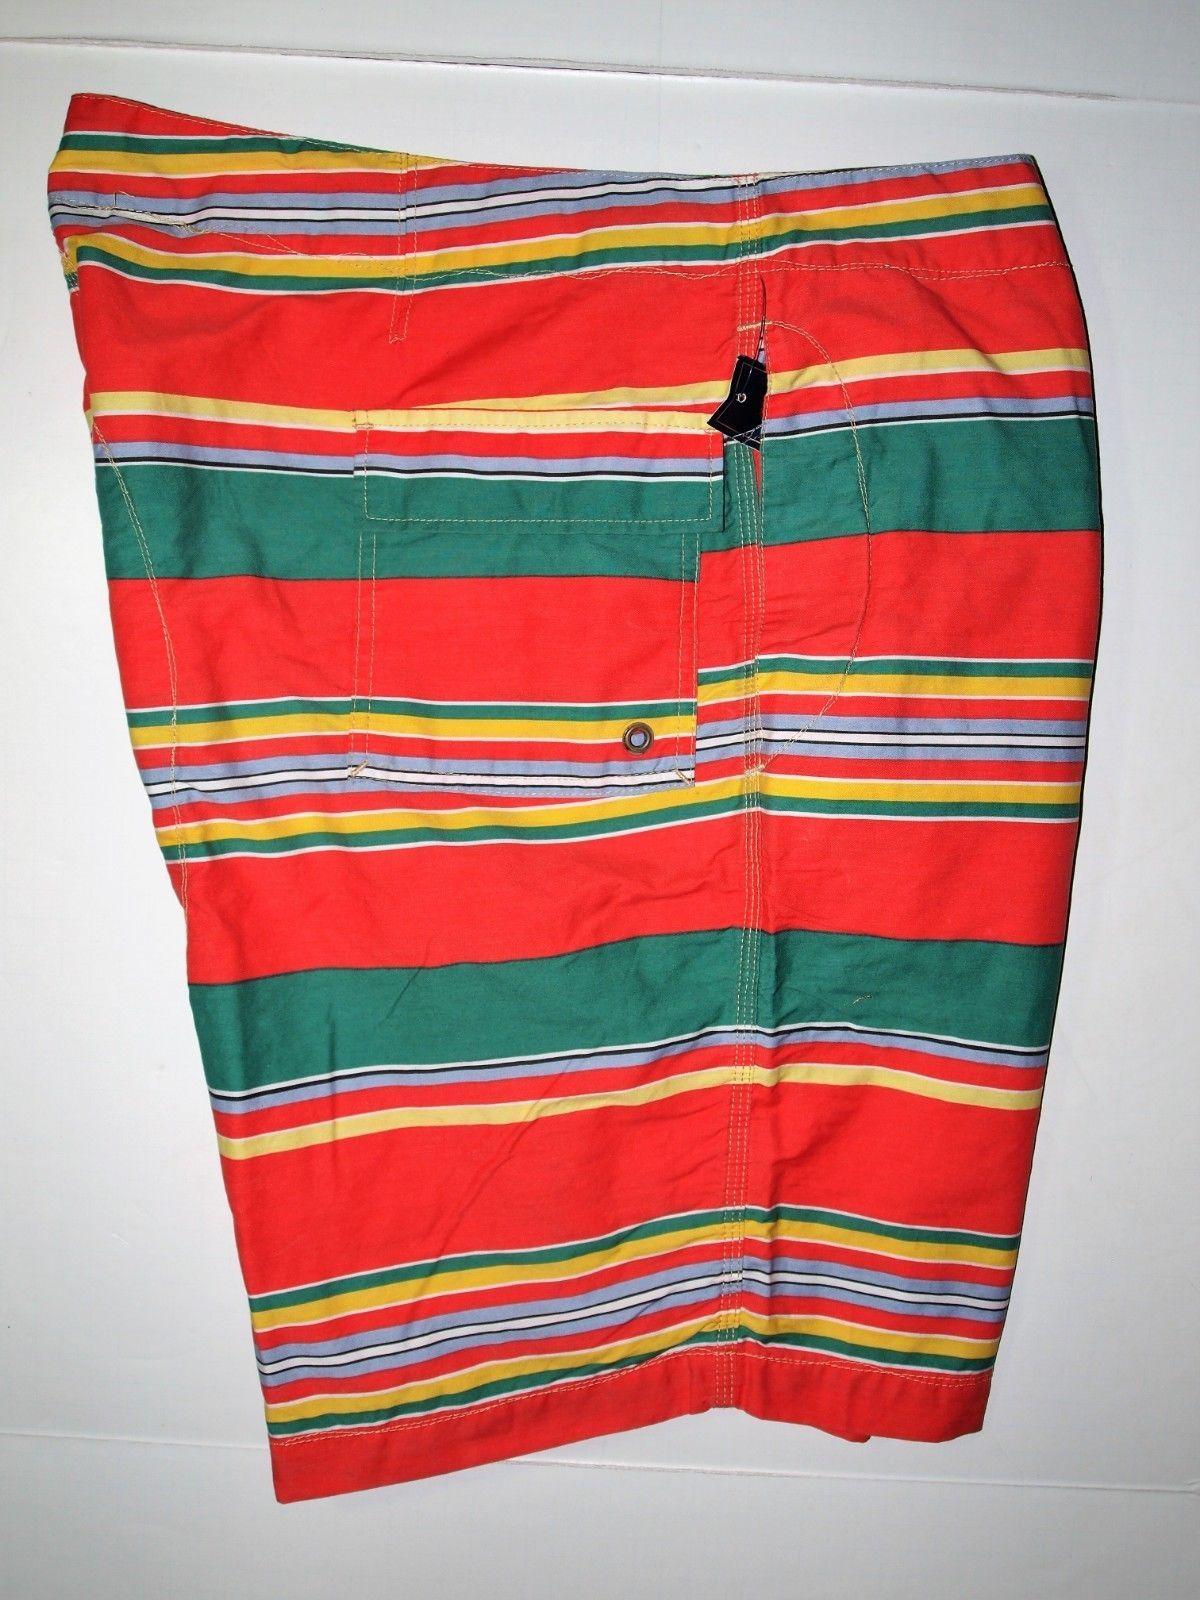 Polo Ralph Lauren size 42 men's board shorts new